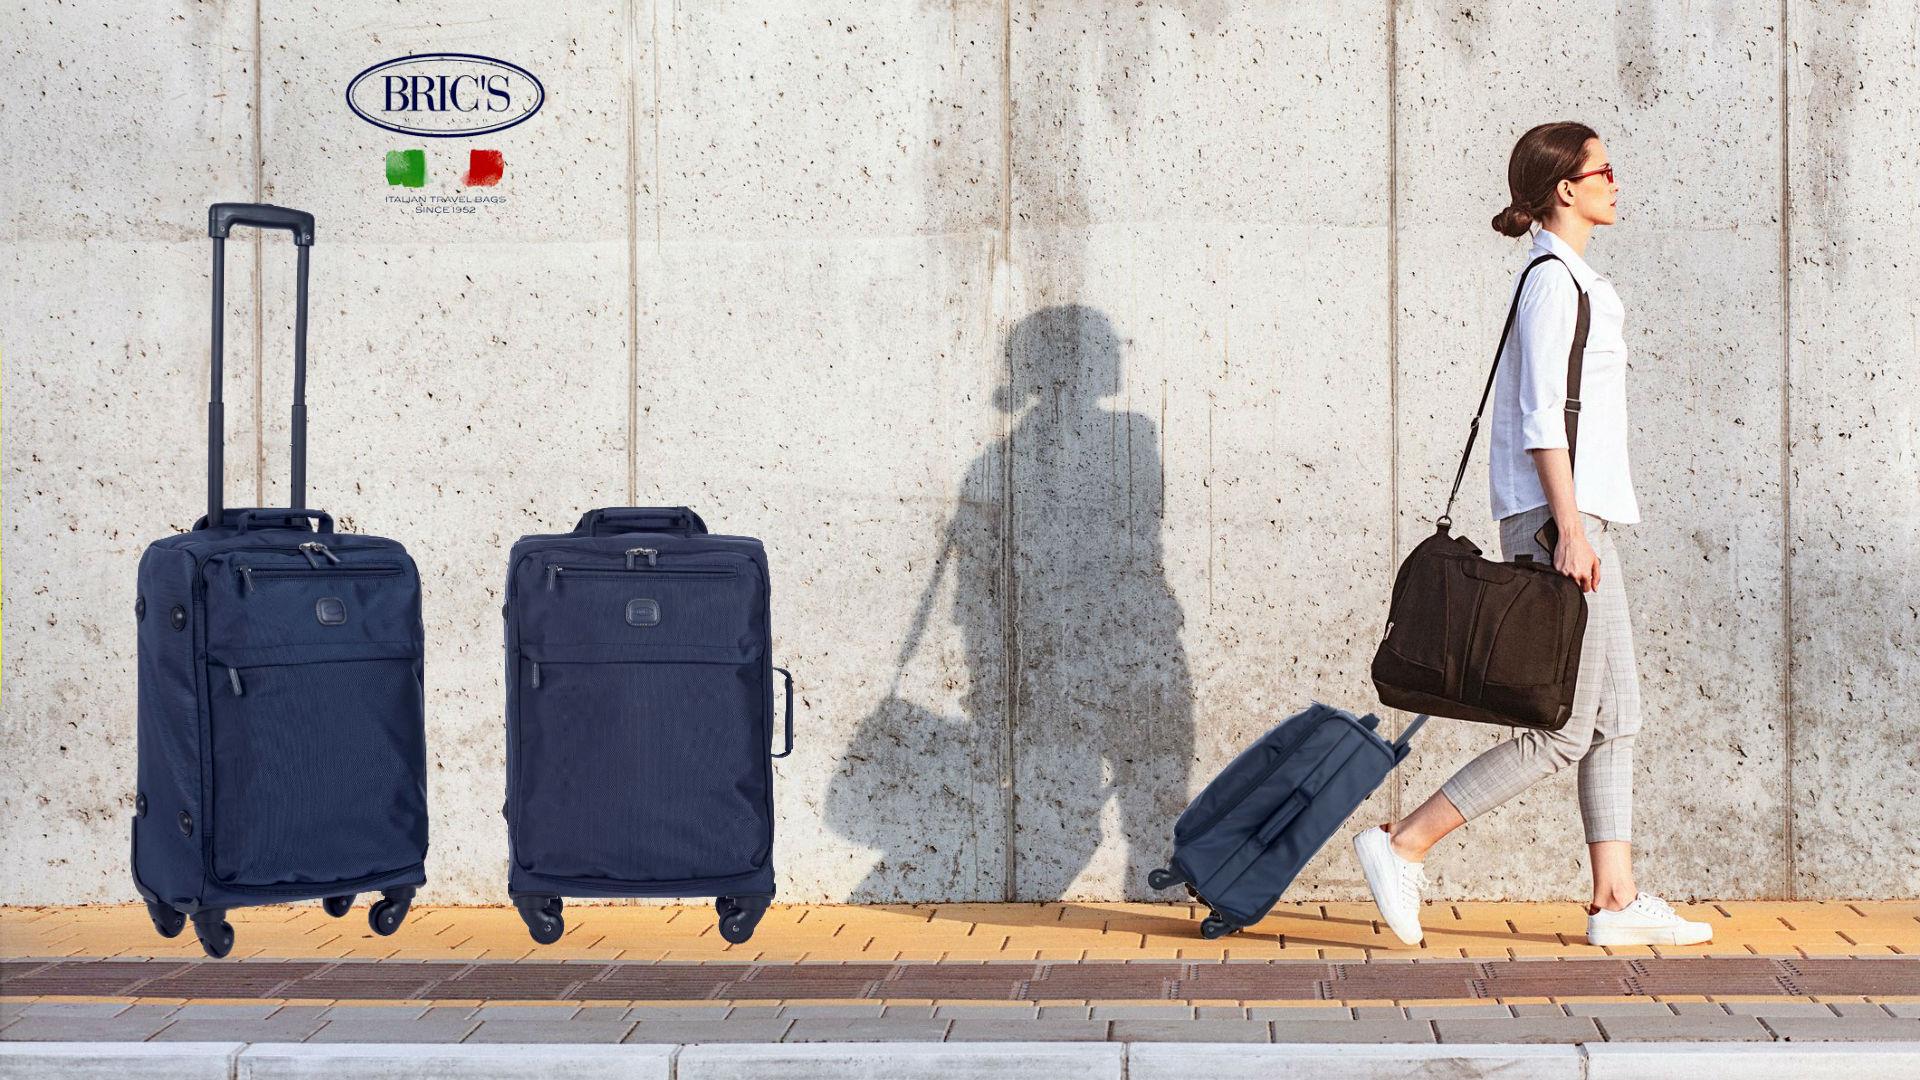 Leggero Ultralight 22inch Cabin Spinner Luggage